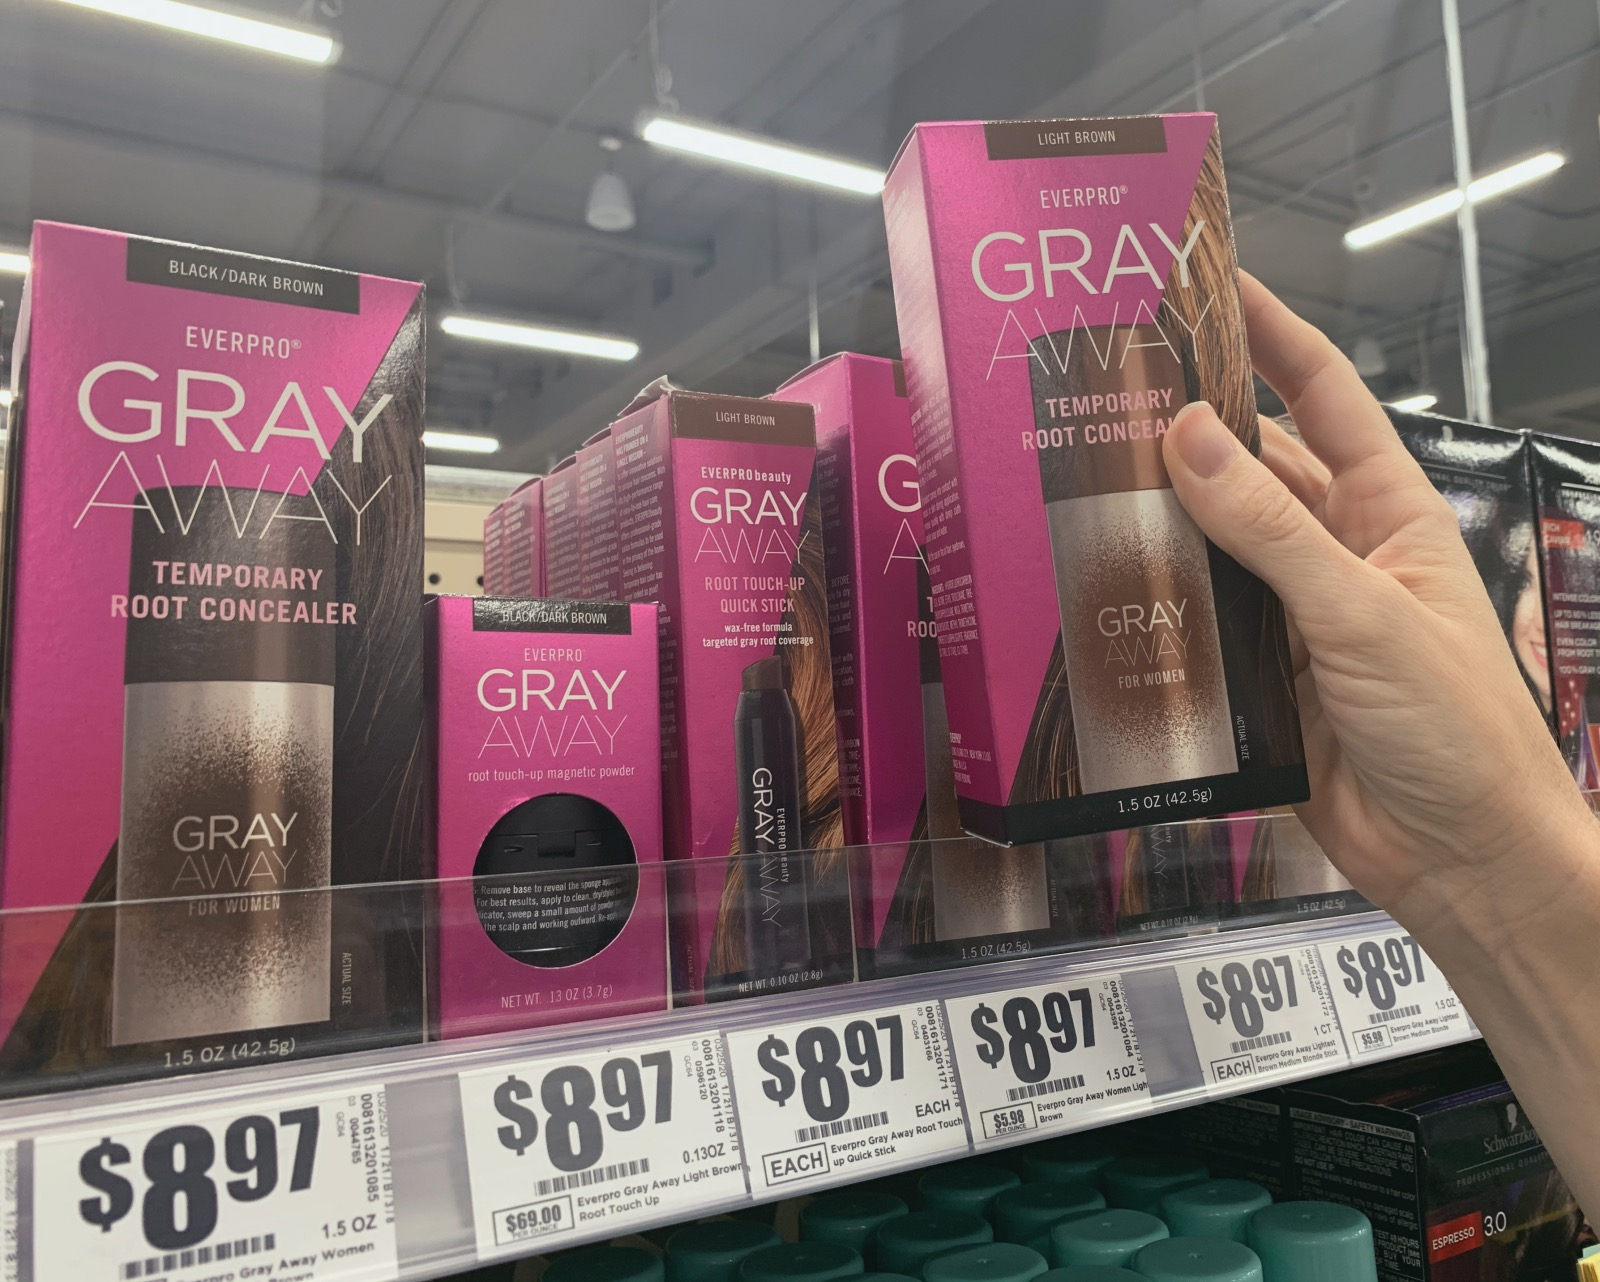 find everpro gray away at heb - pop shop america